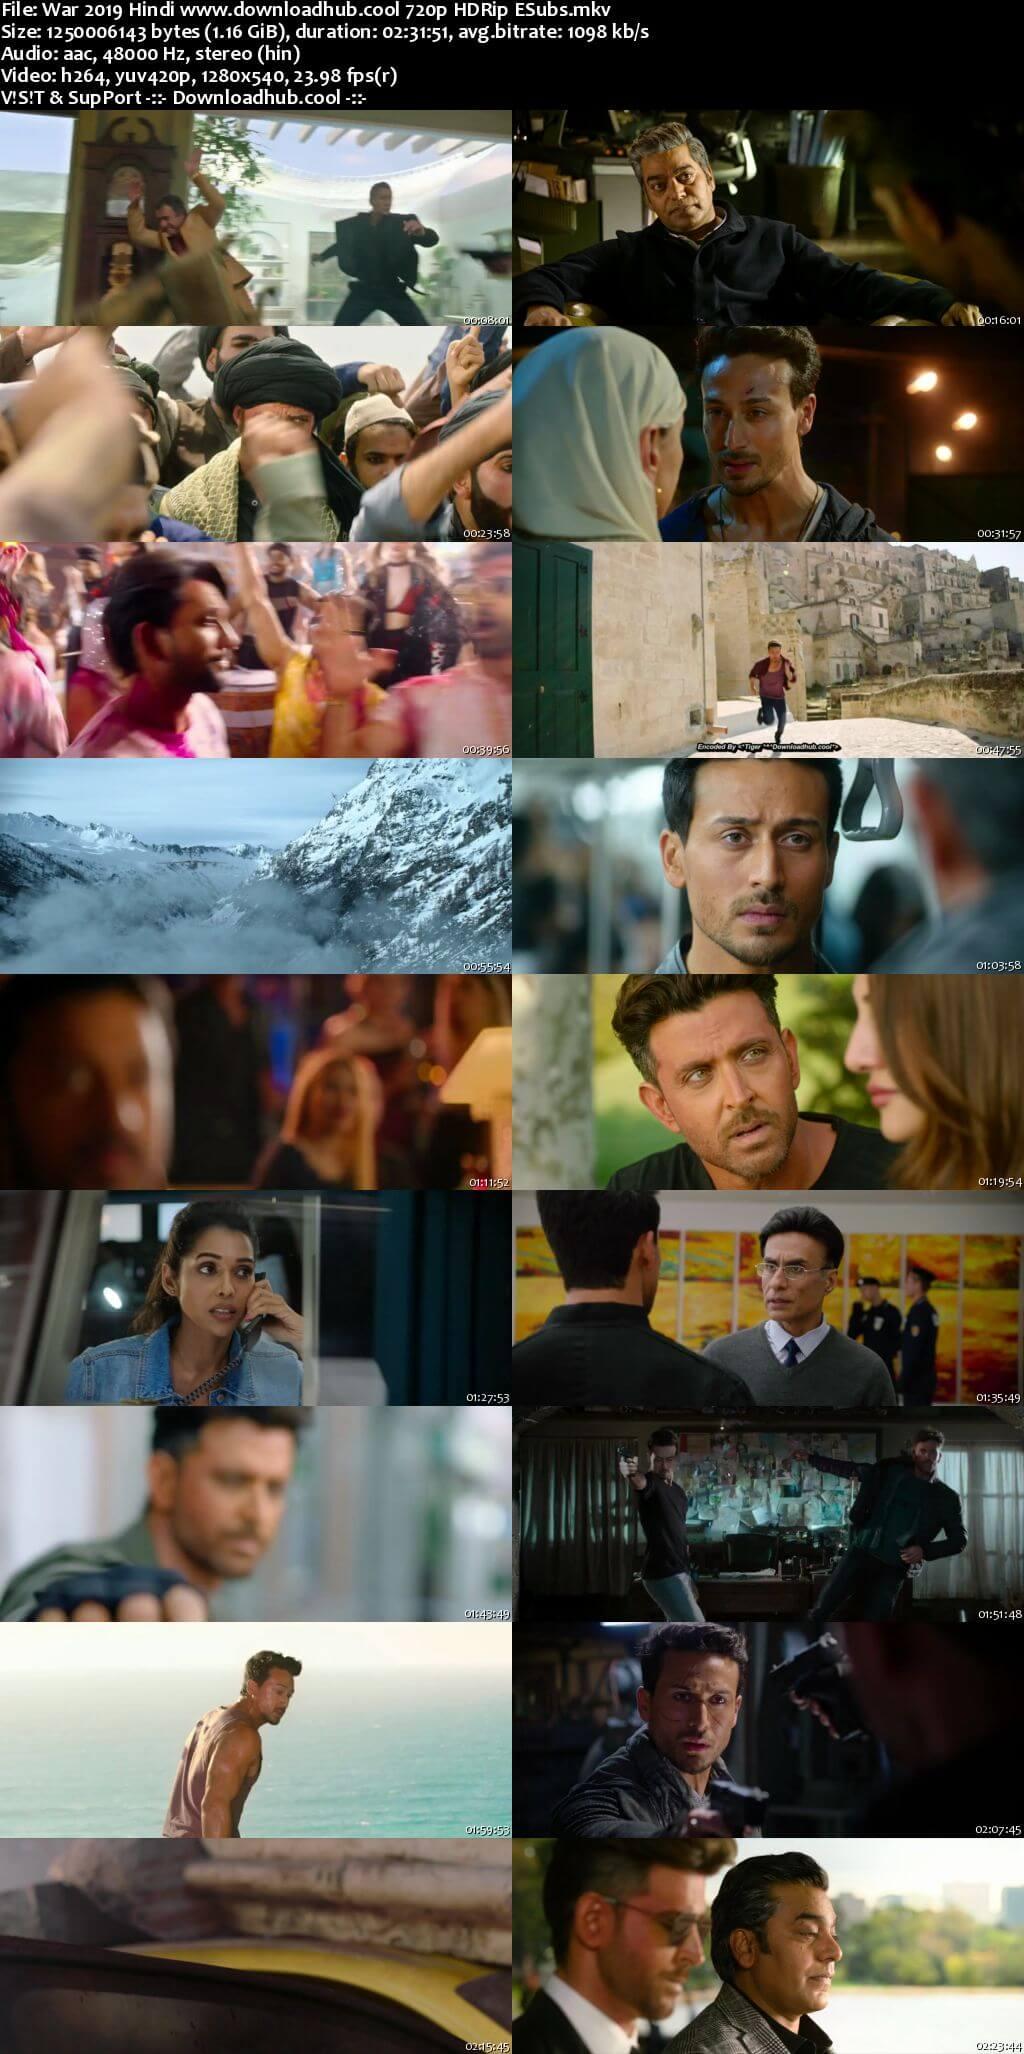 War 2019 Hindi 720p HDRip ESubs